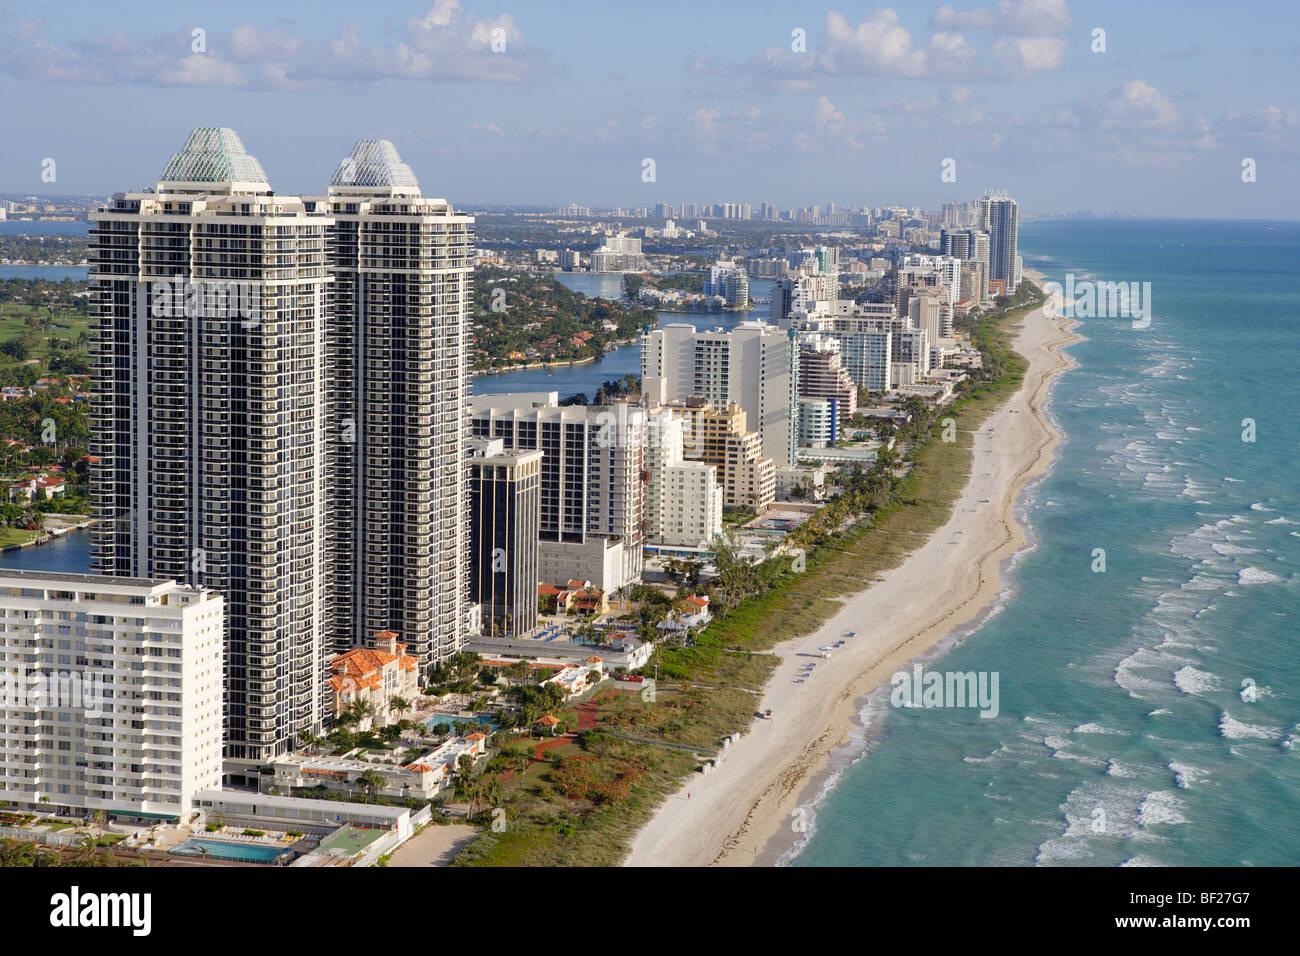 Chase Bank In Miami Beach Florida